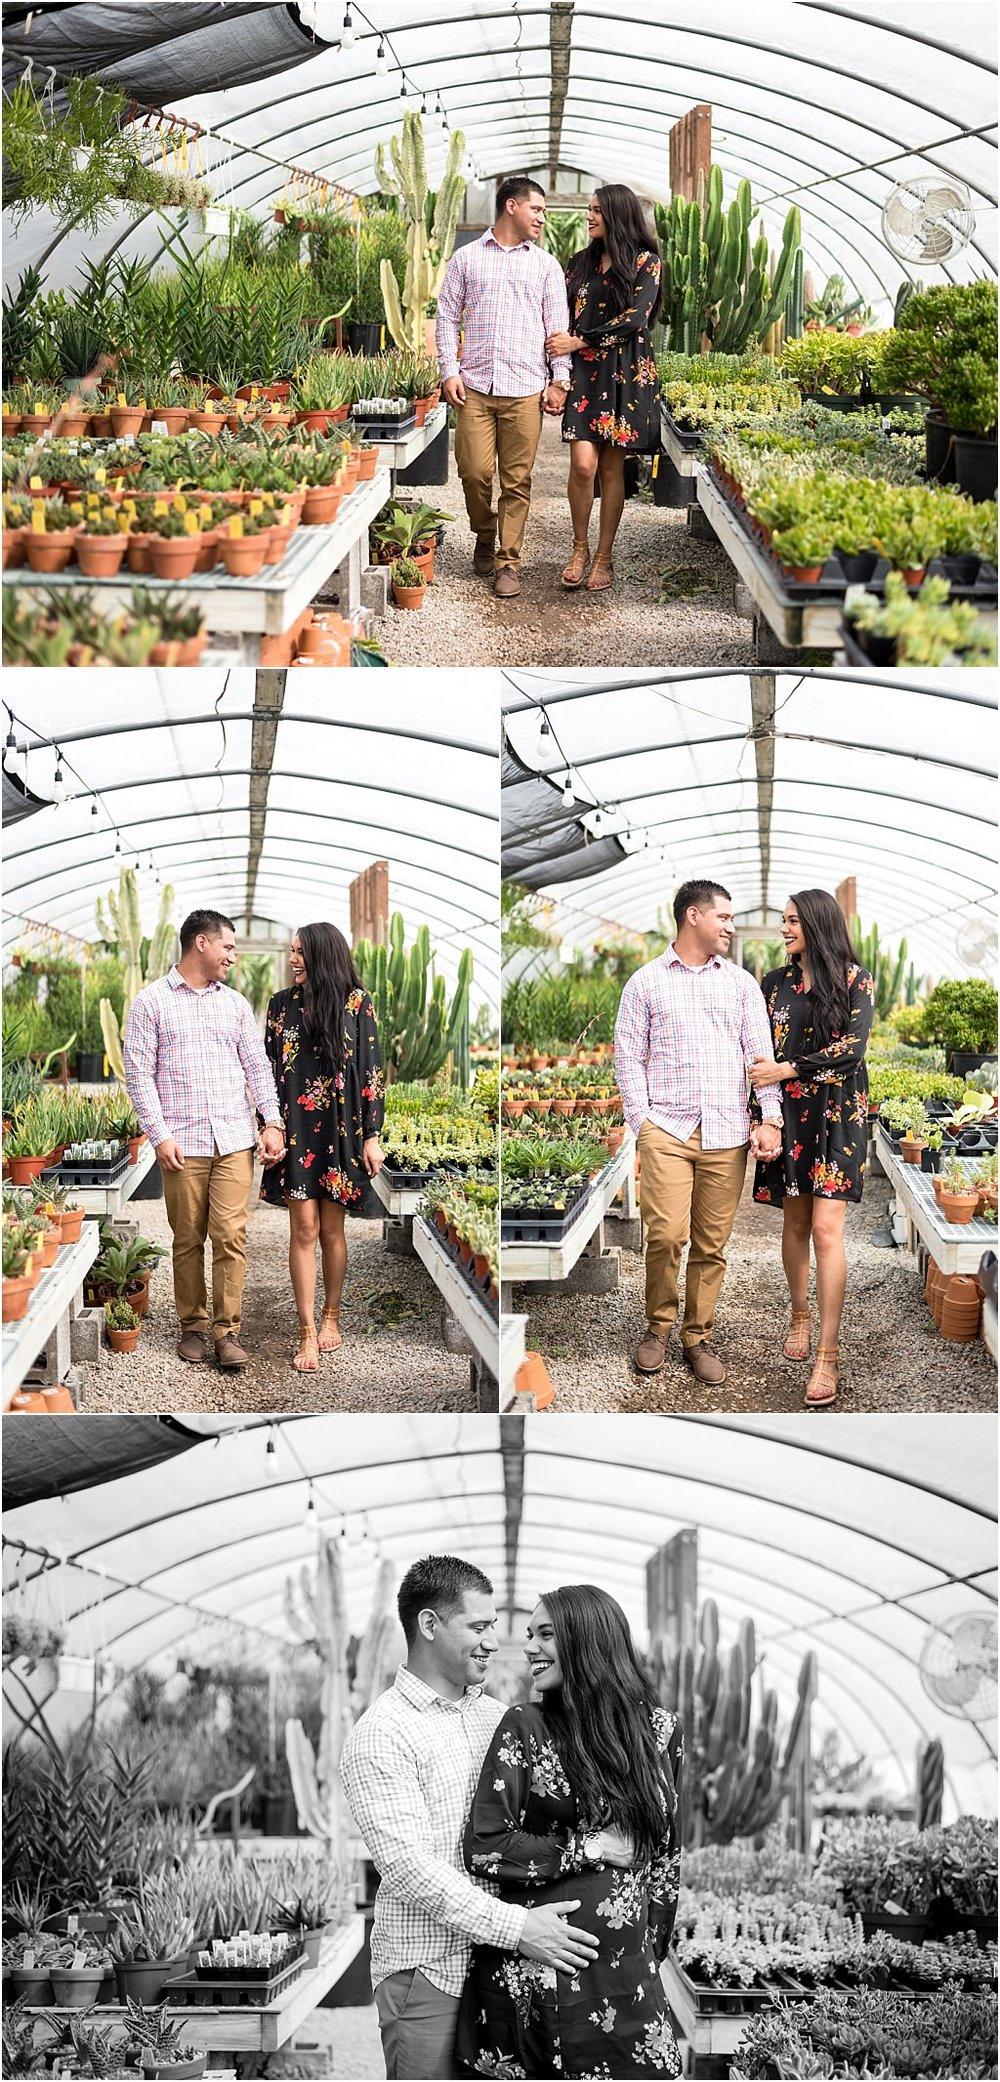 Hewitt-Garden-Center-Green-House-Phoography-Session-Pregnancy-Announcement-Nashville-Lifestyle-Photographer+2